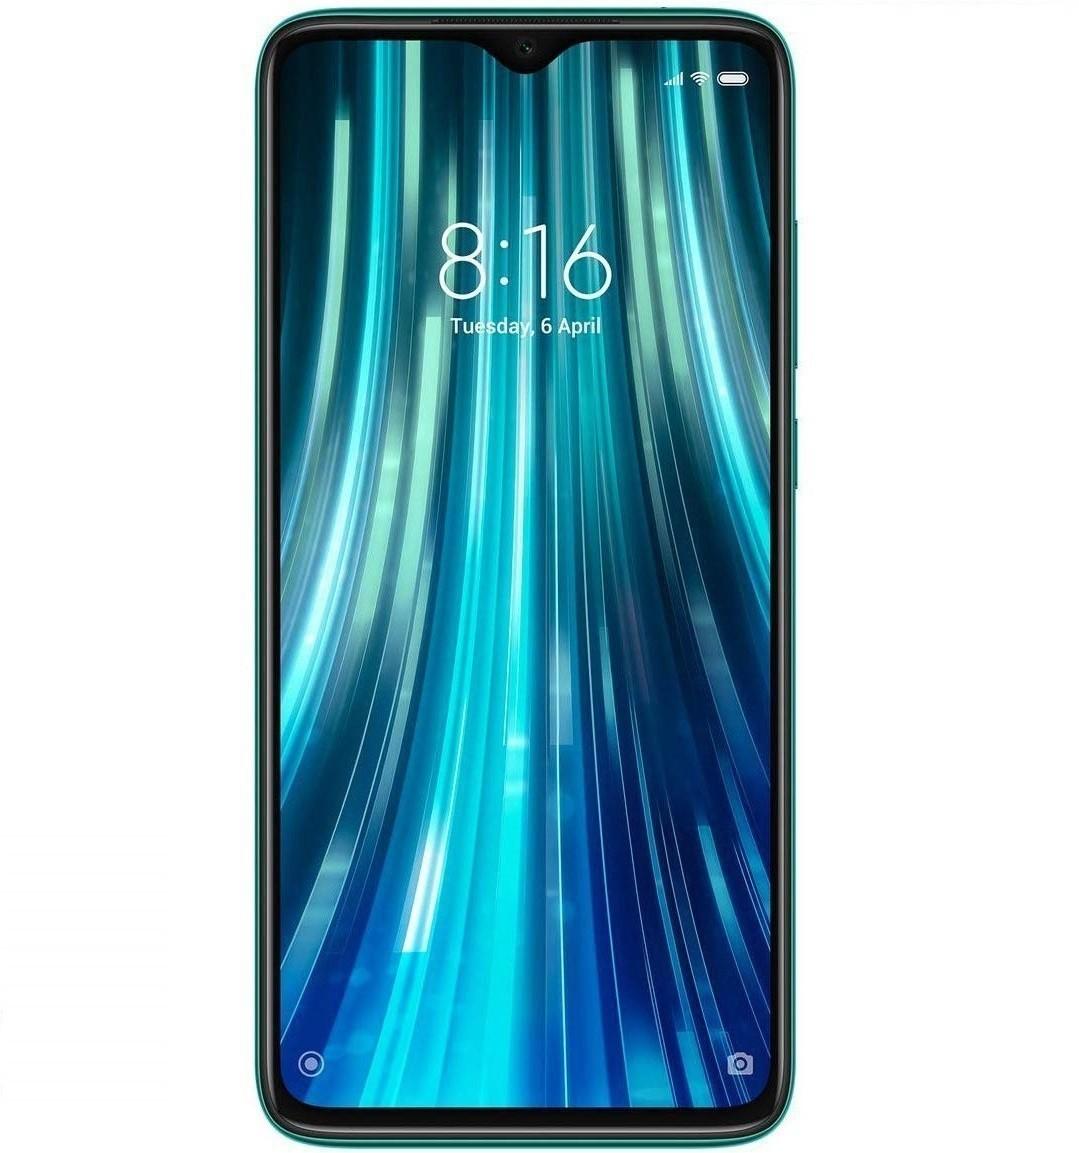 Redmi Gaming Phone Under 20000 Rupees